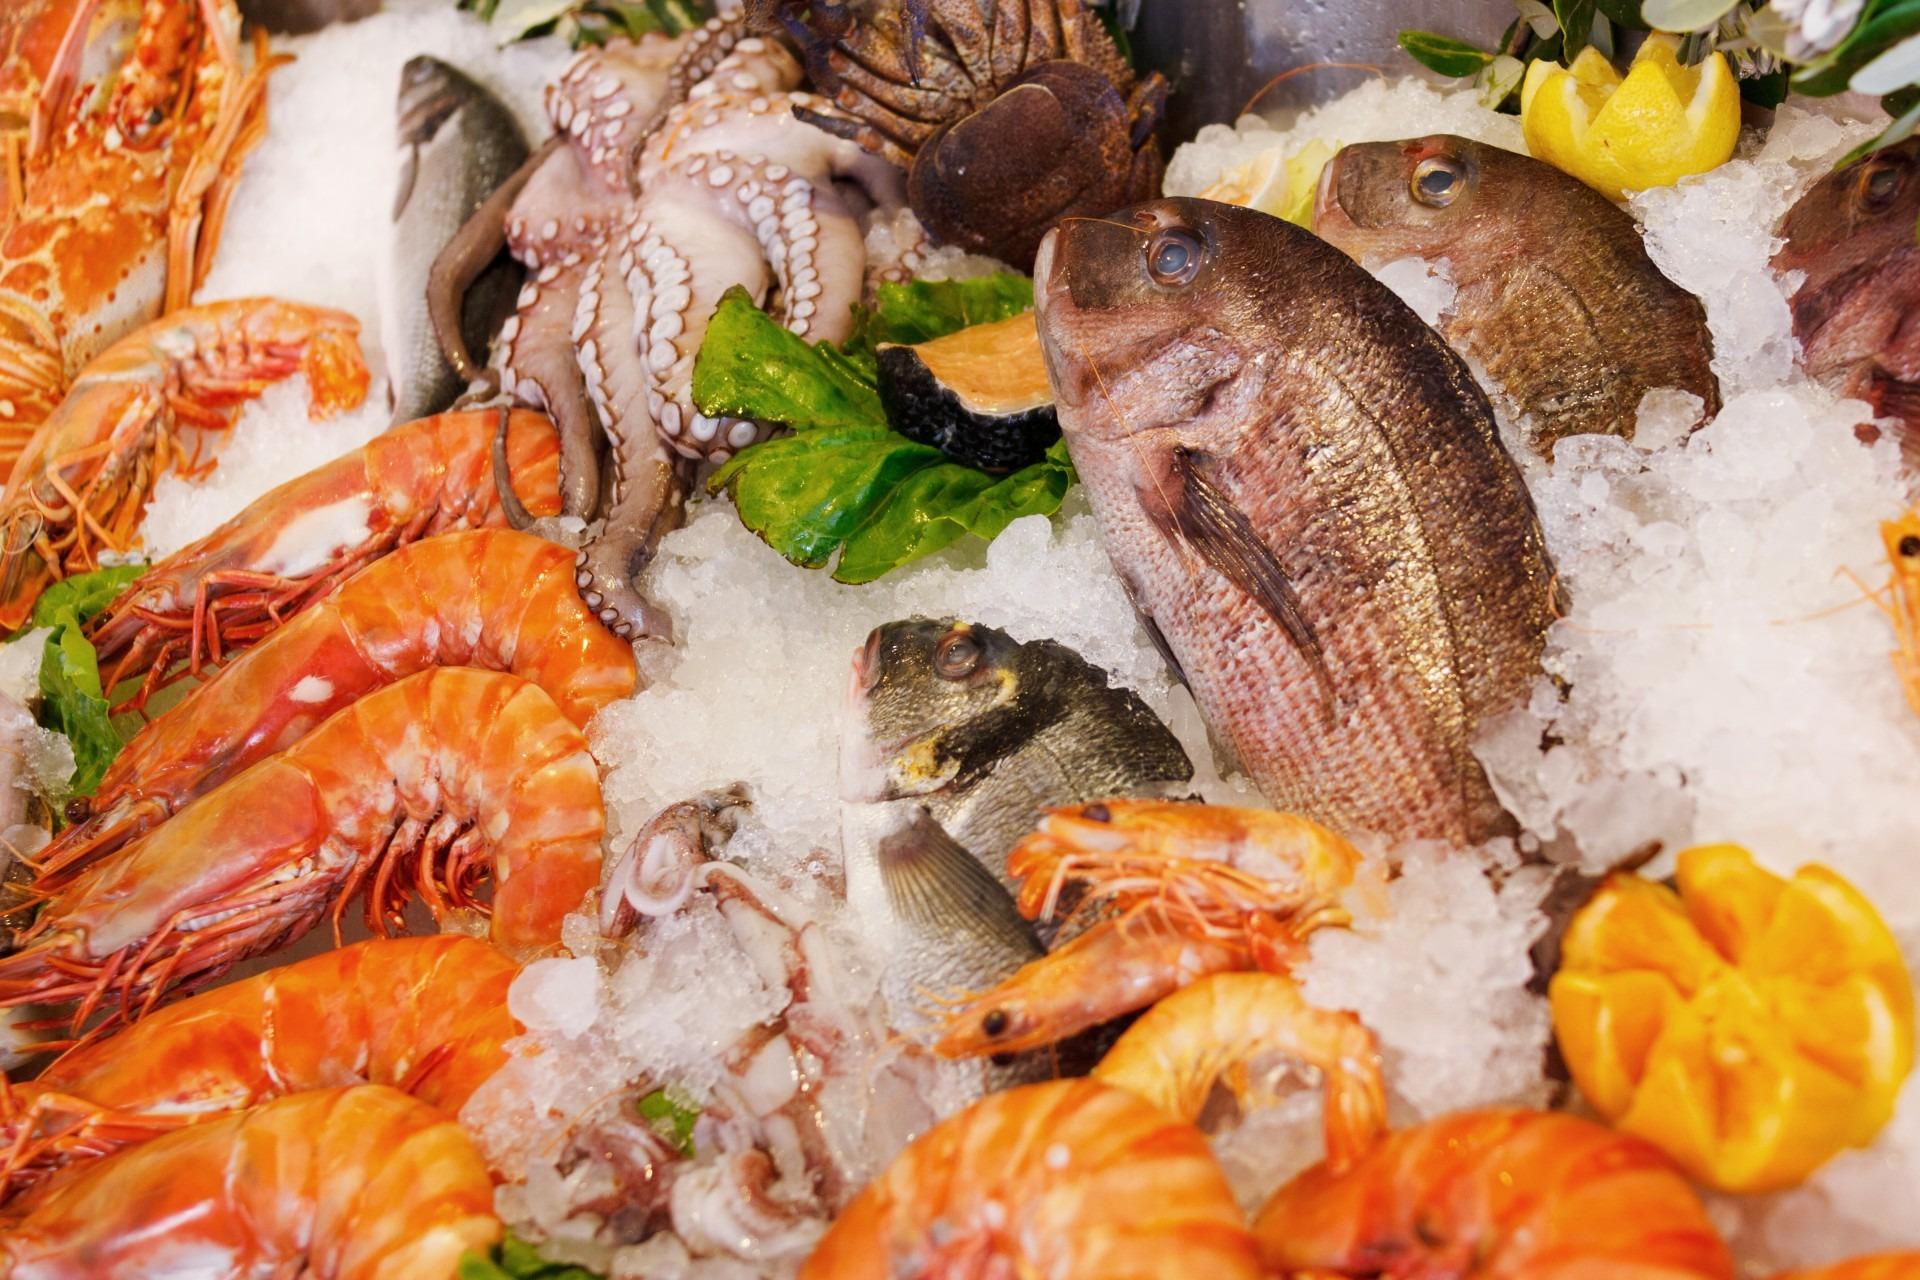 Gambar Restoran Es Hidangan Makanan Laut Segar Ikan